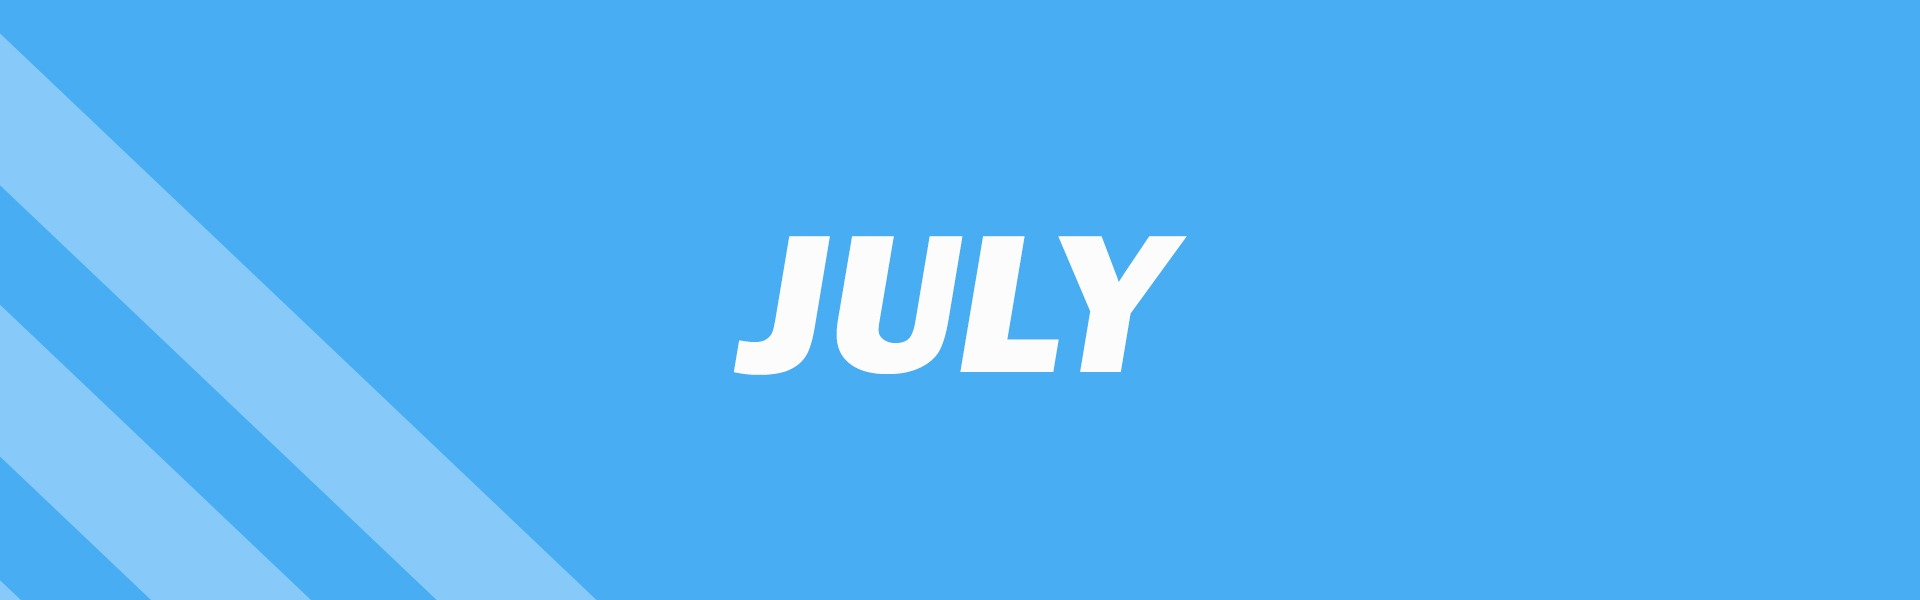 july-declaration-banner